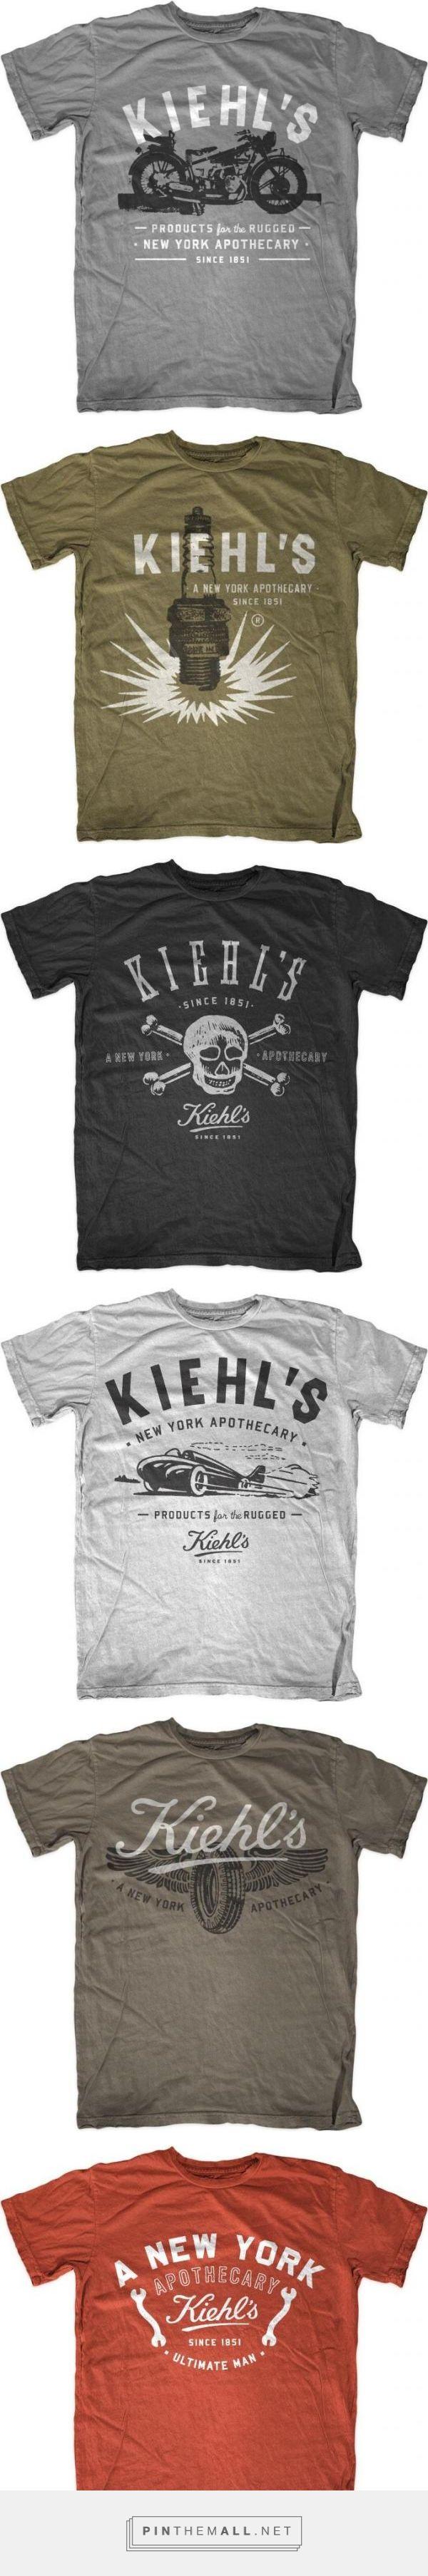 Kiehl's shirt artwork by The Neighborhood Studio (aka Curtis Jinkins)